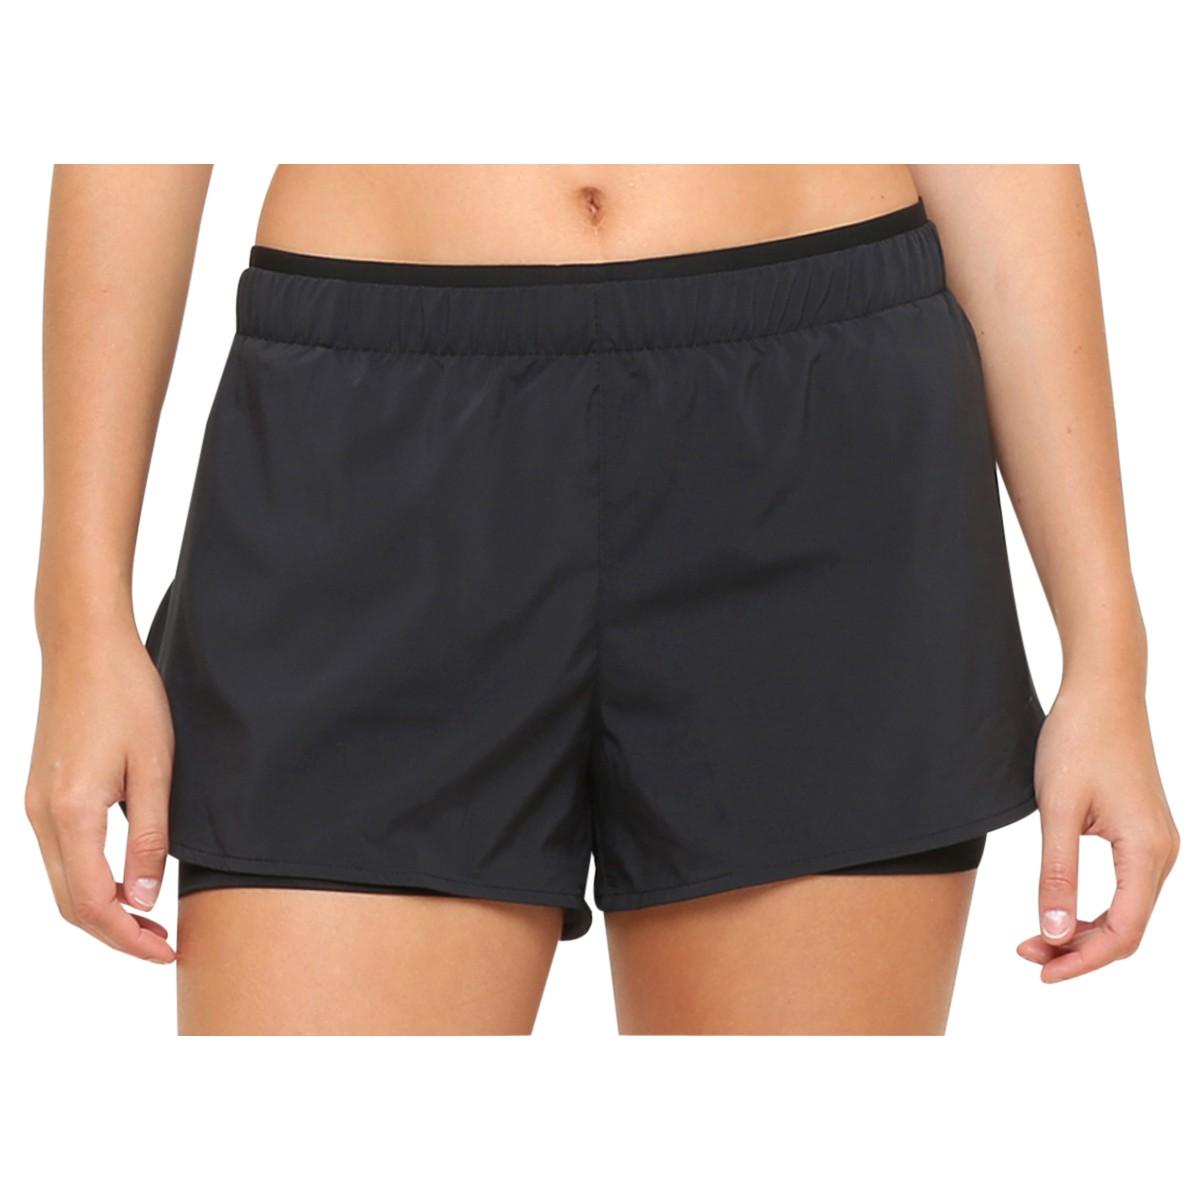 6840e781e4 Short Feminino Nike Full Flex 2 In 1 777488-010 - Preto - Botas ...